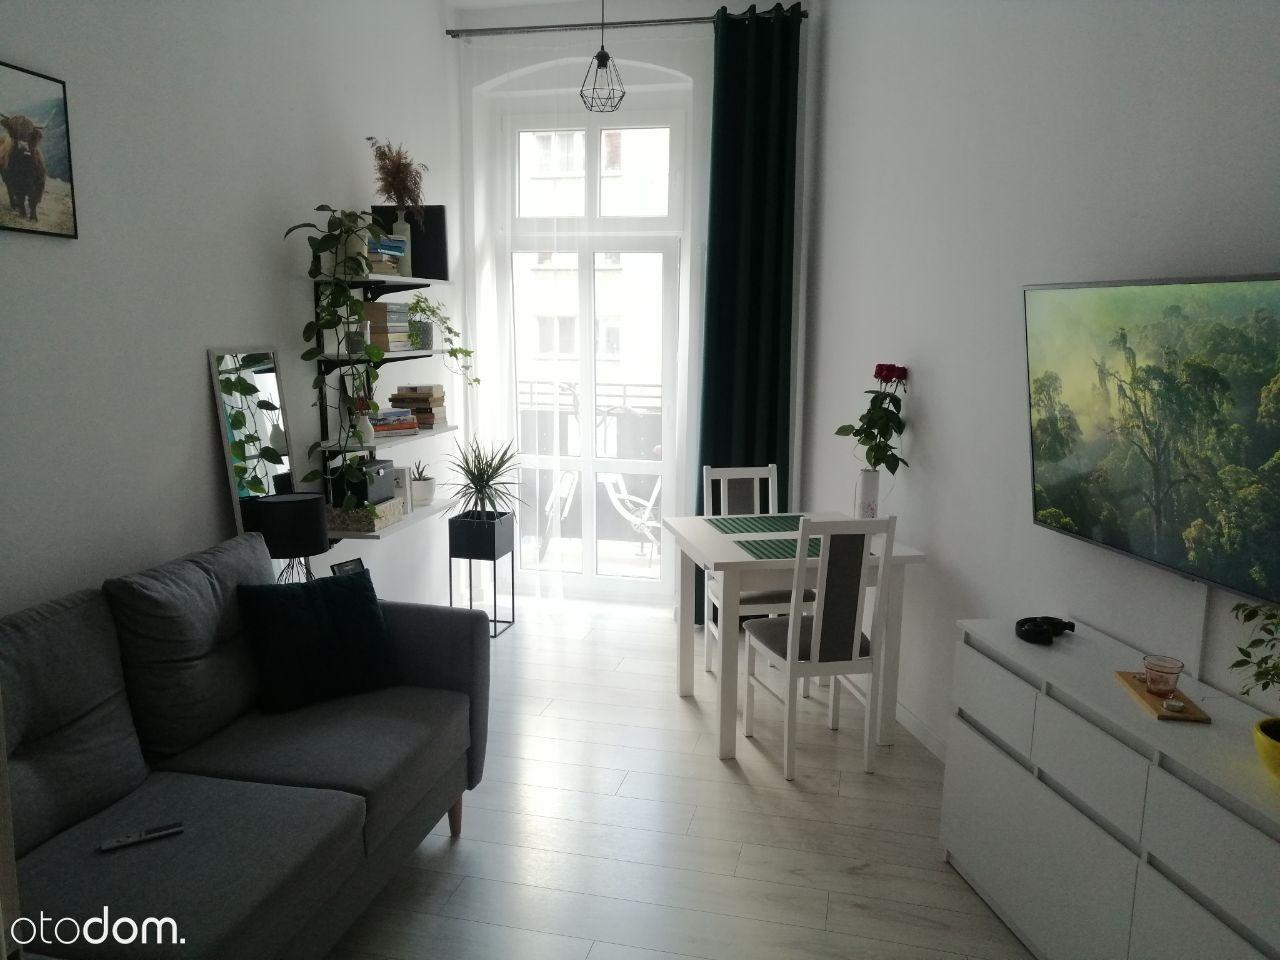 2 pokoje, kuchnia, balkon, internet, bezpośrednio